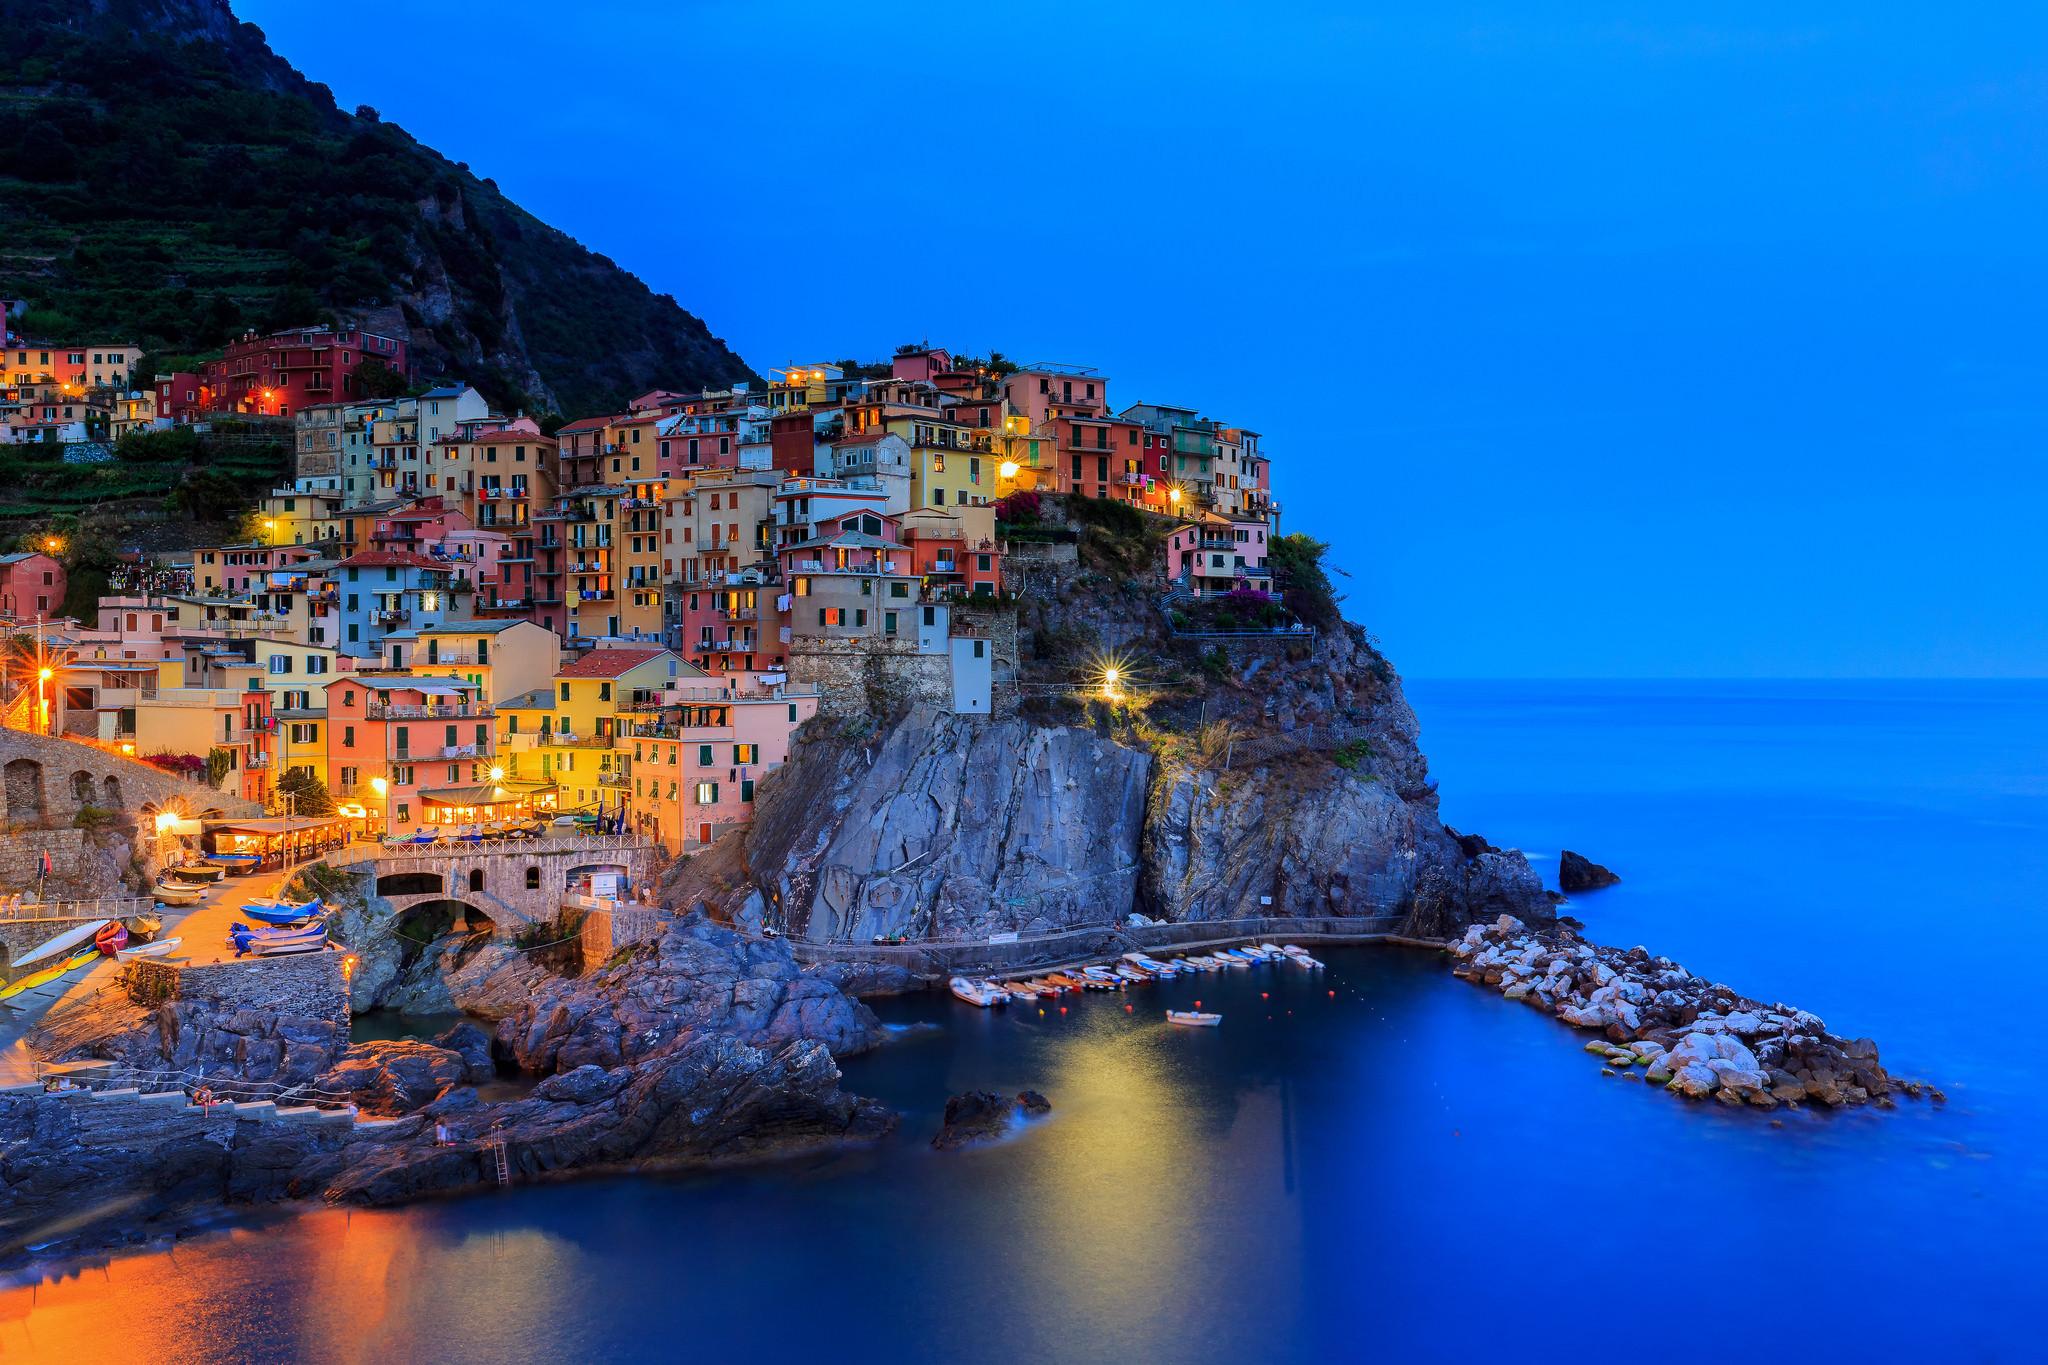 обои Manarola, Cinque Terre, Италия картинки фото